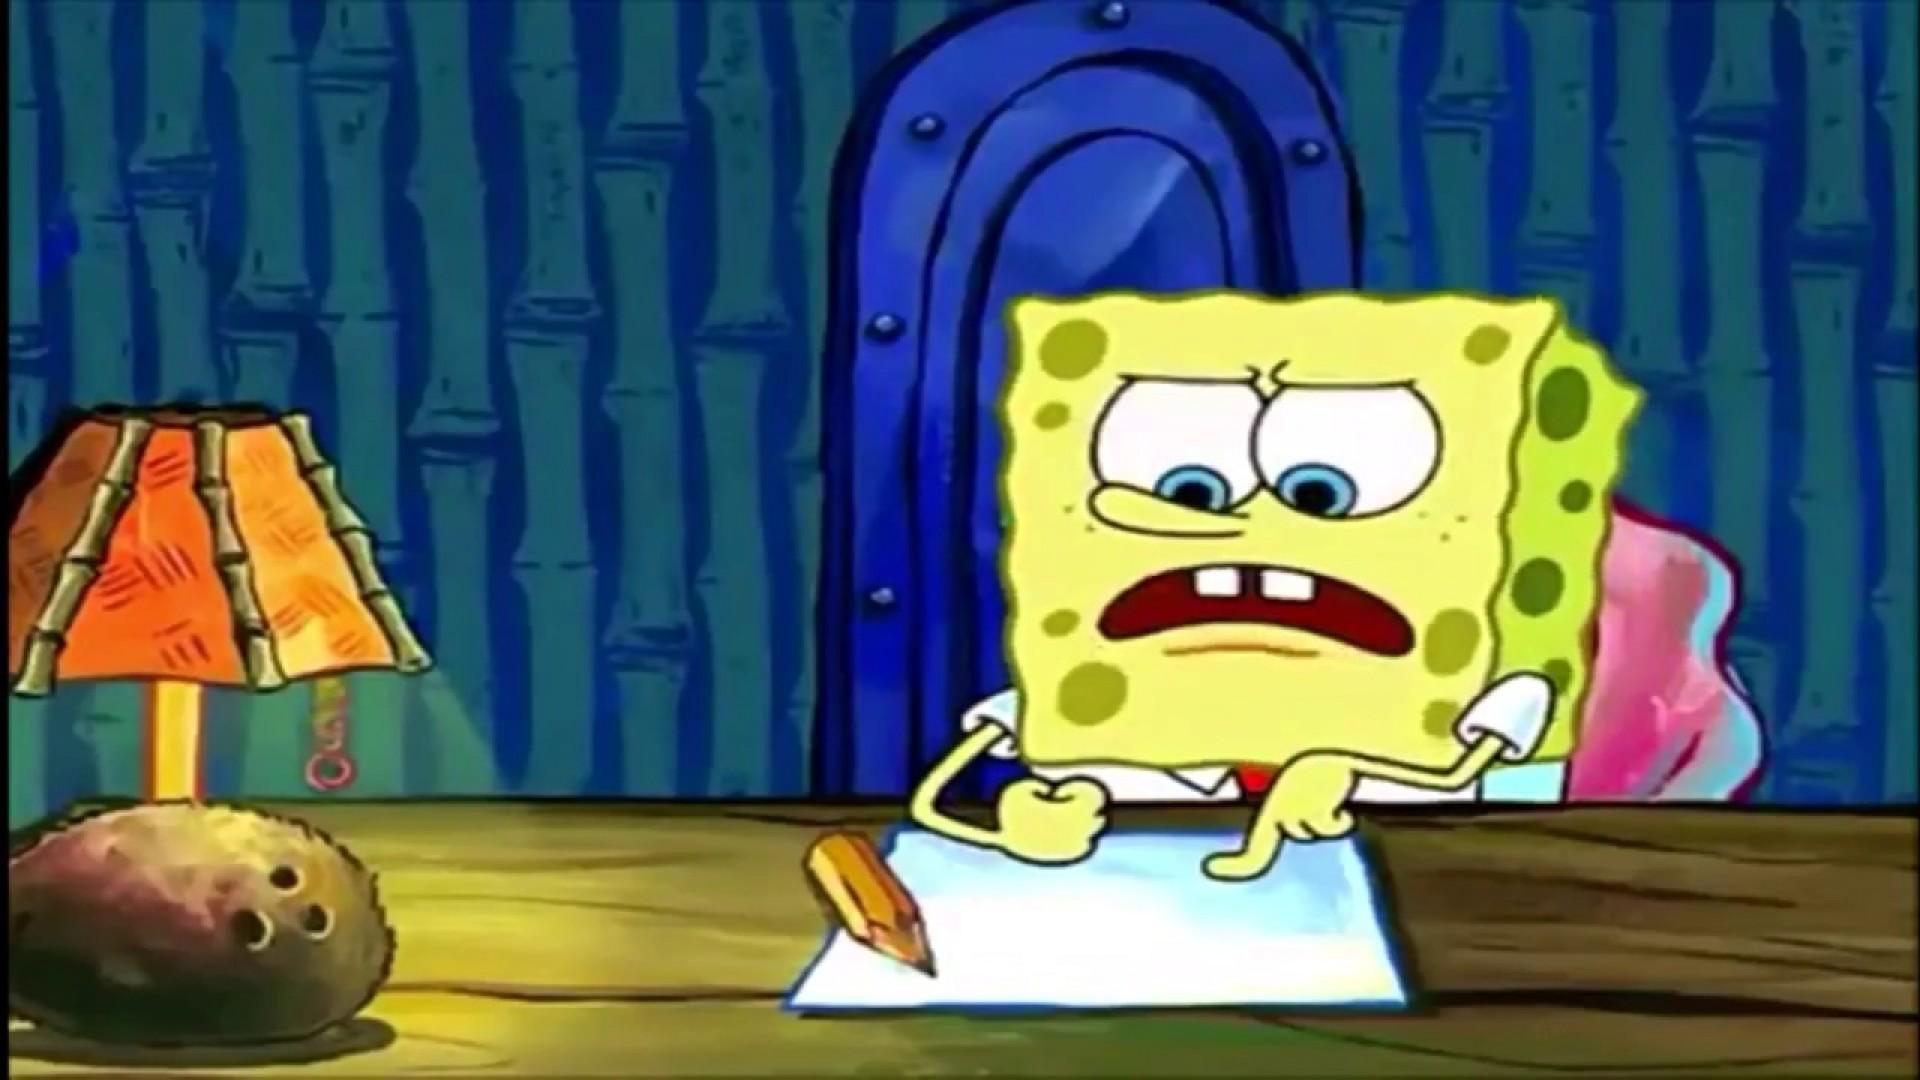 002 Maxresdefault Spongebob Essay Meme Stirring Generator Font 1920